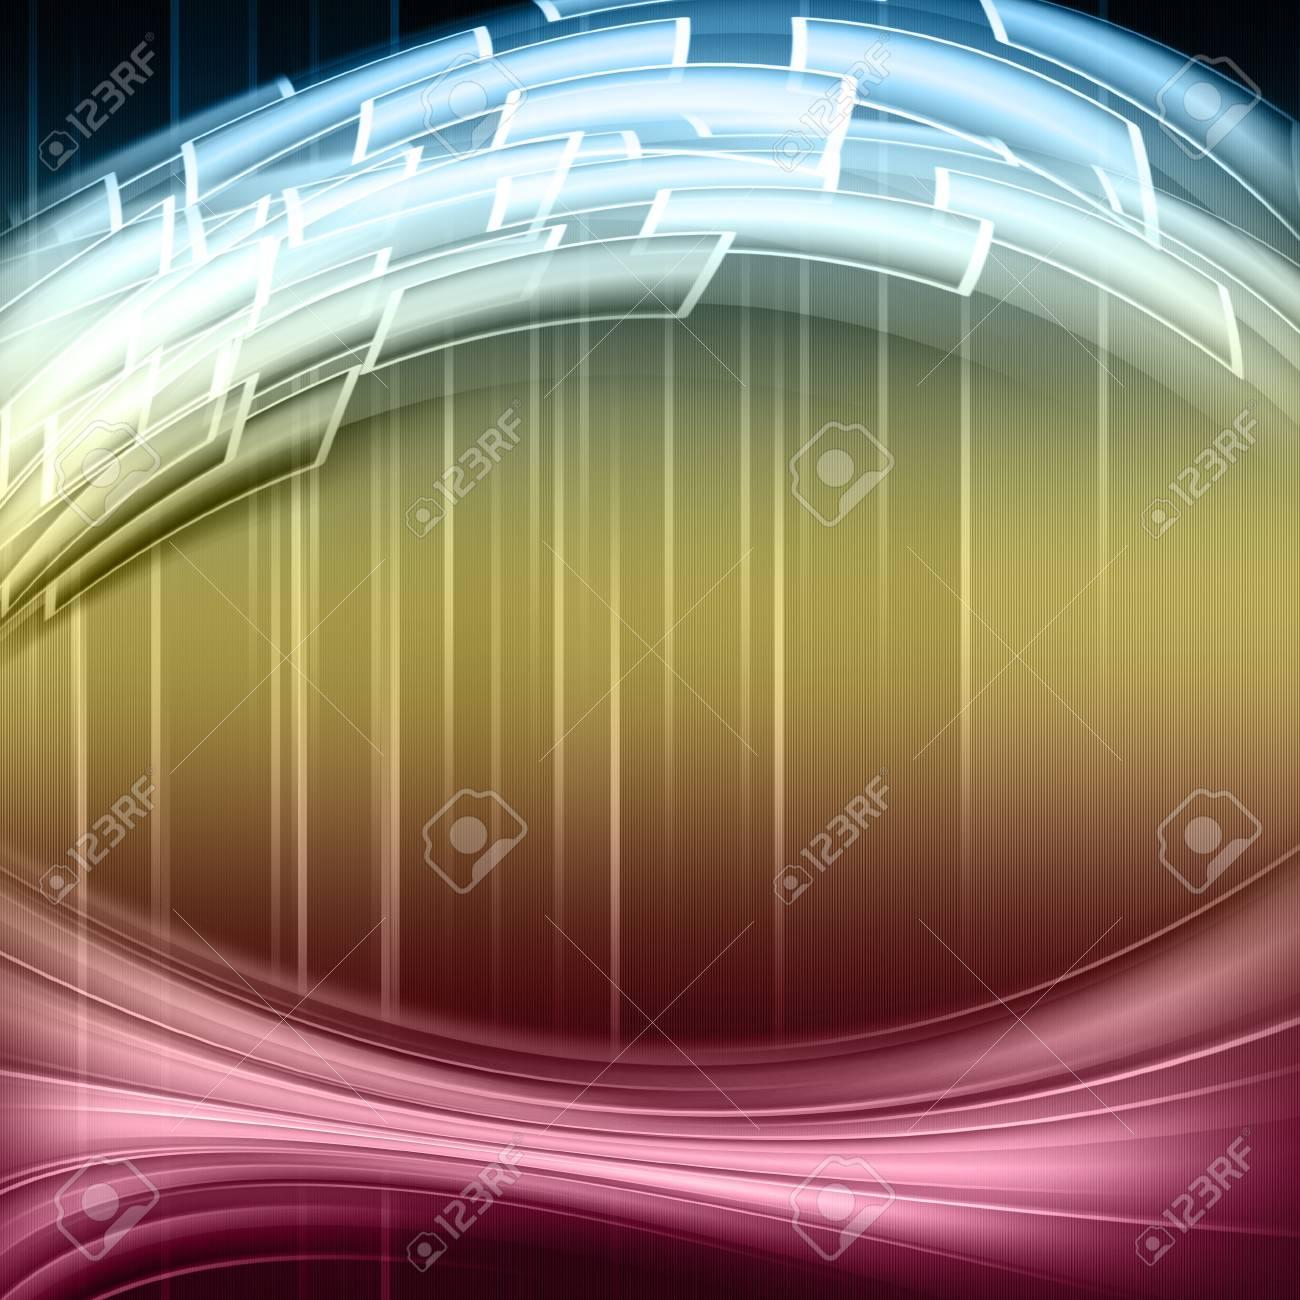 Fantastic elegant and powerful background design illustration Stock Photo - 14604469